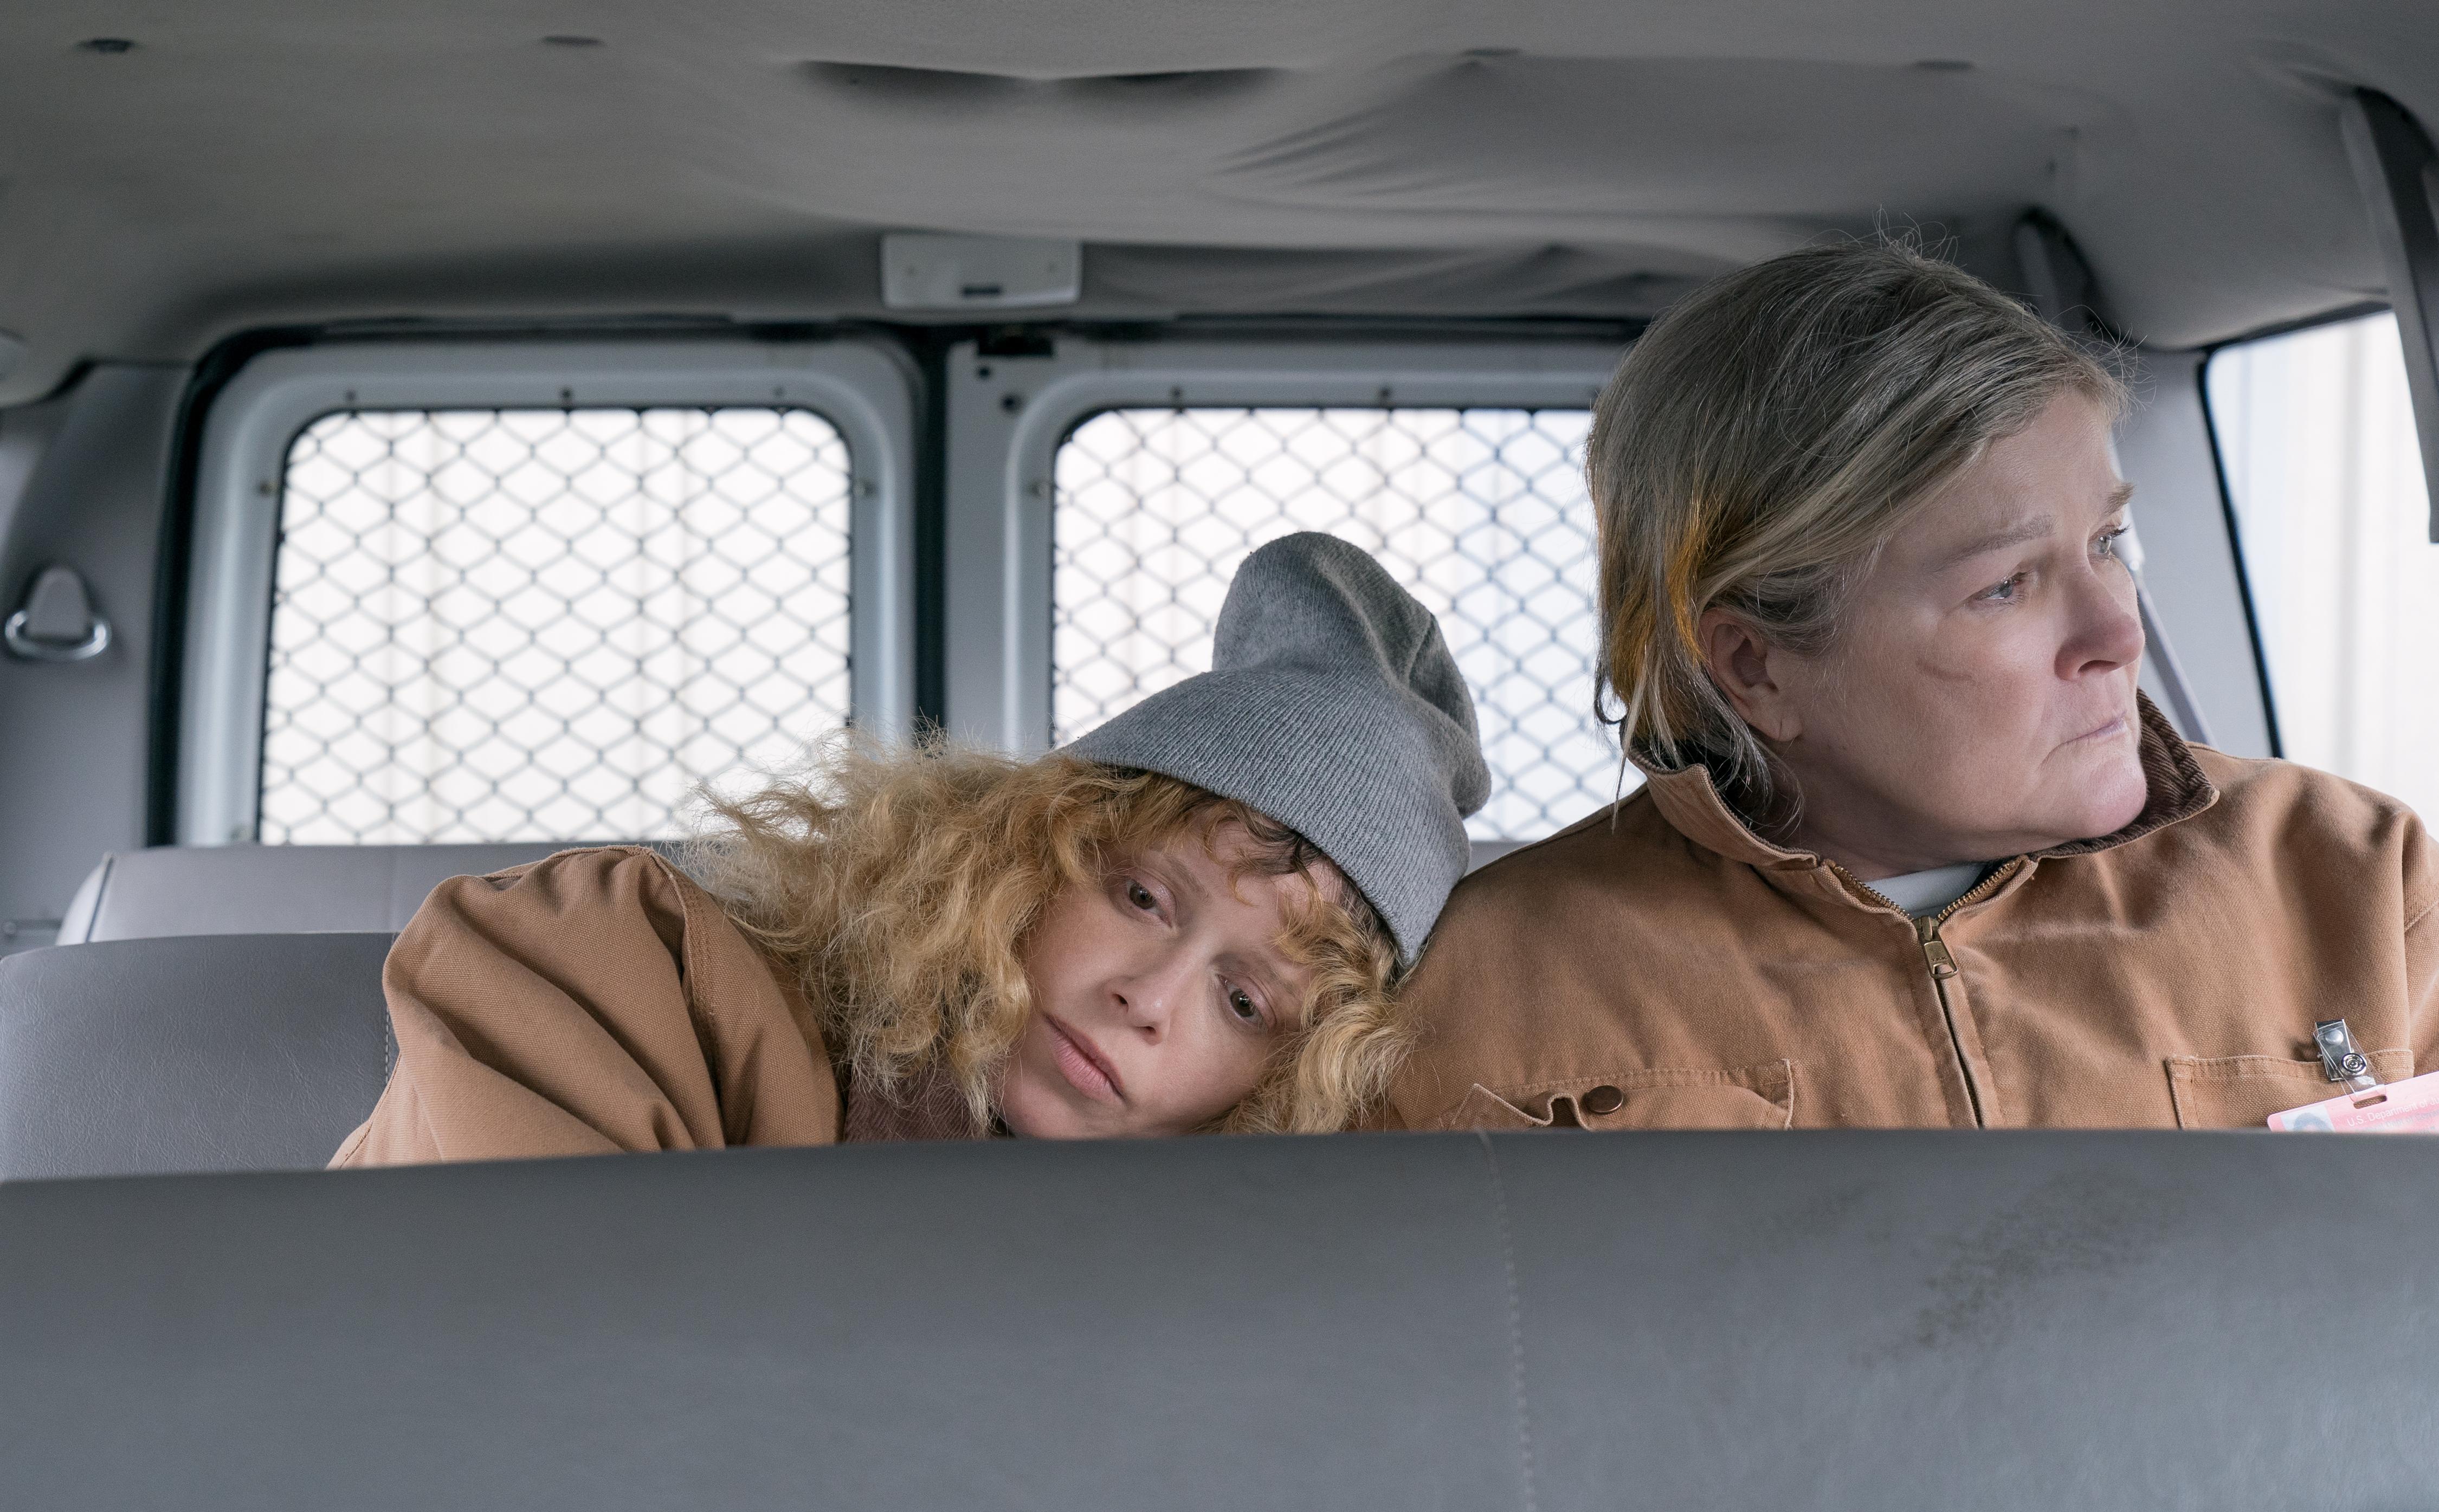 Kate Mulgrew and Natasha Lyonne in Orange Is the New Black (2013)